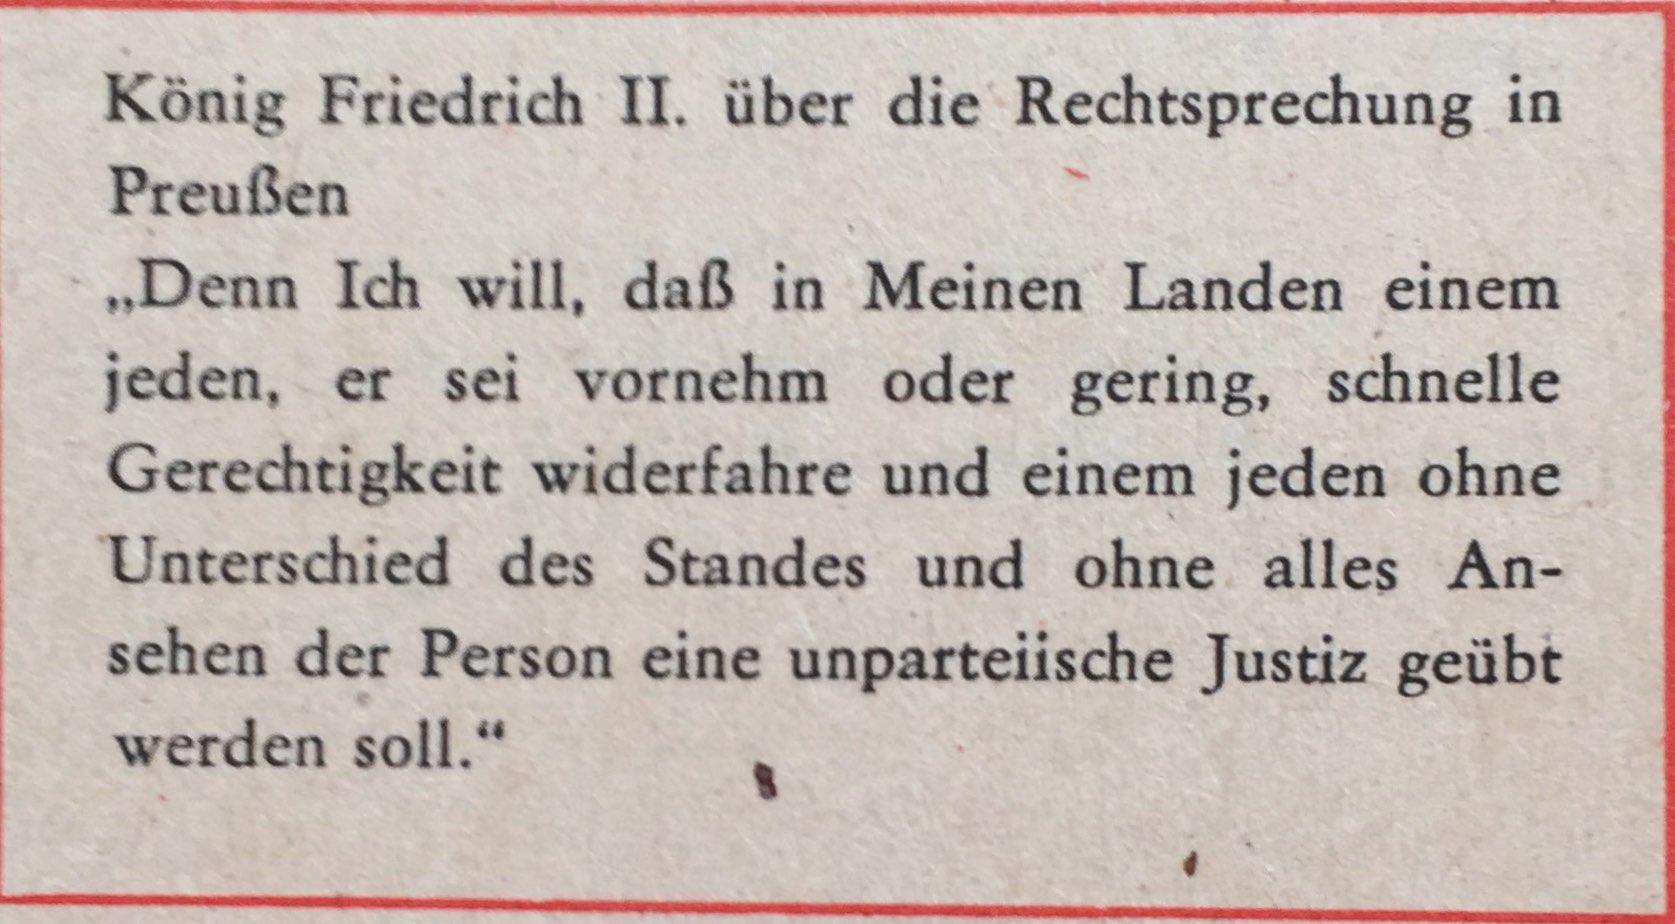 Friedrich II. zu Rechtssprechung in Preußen